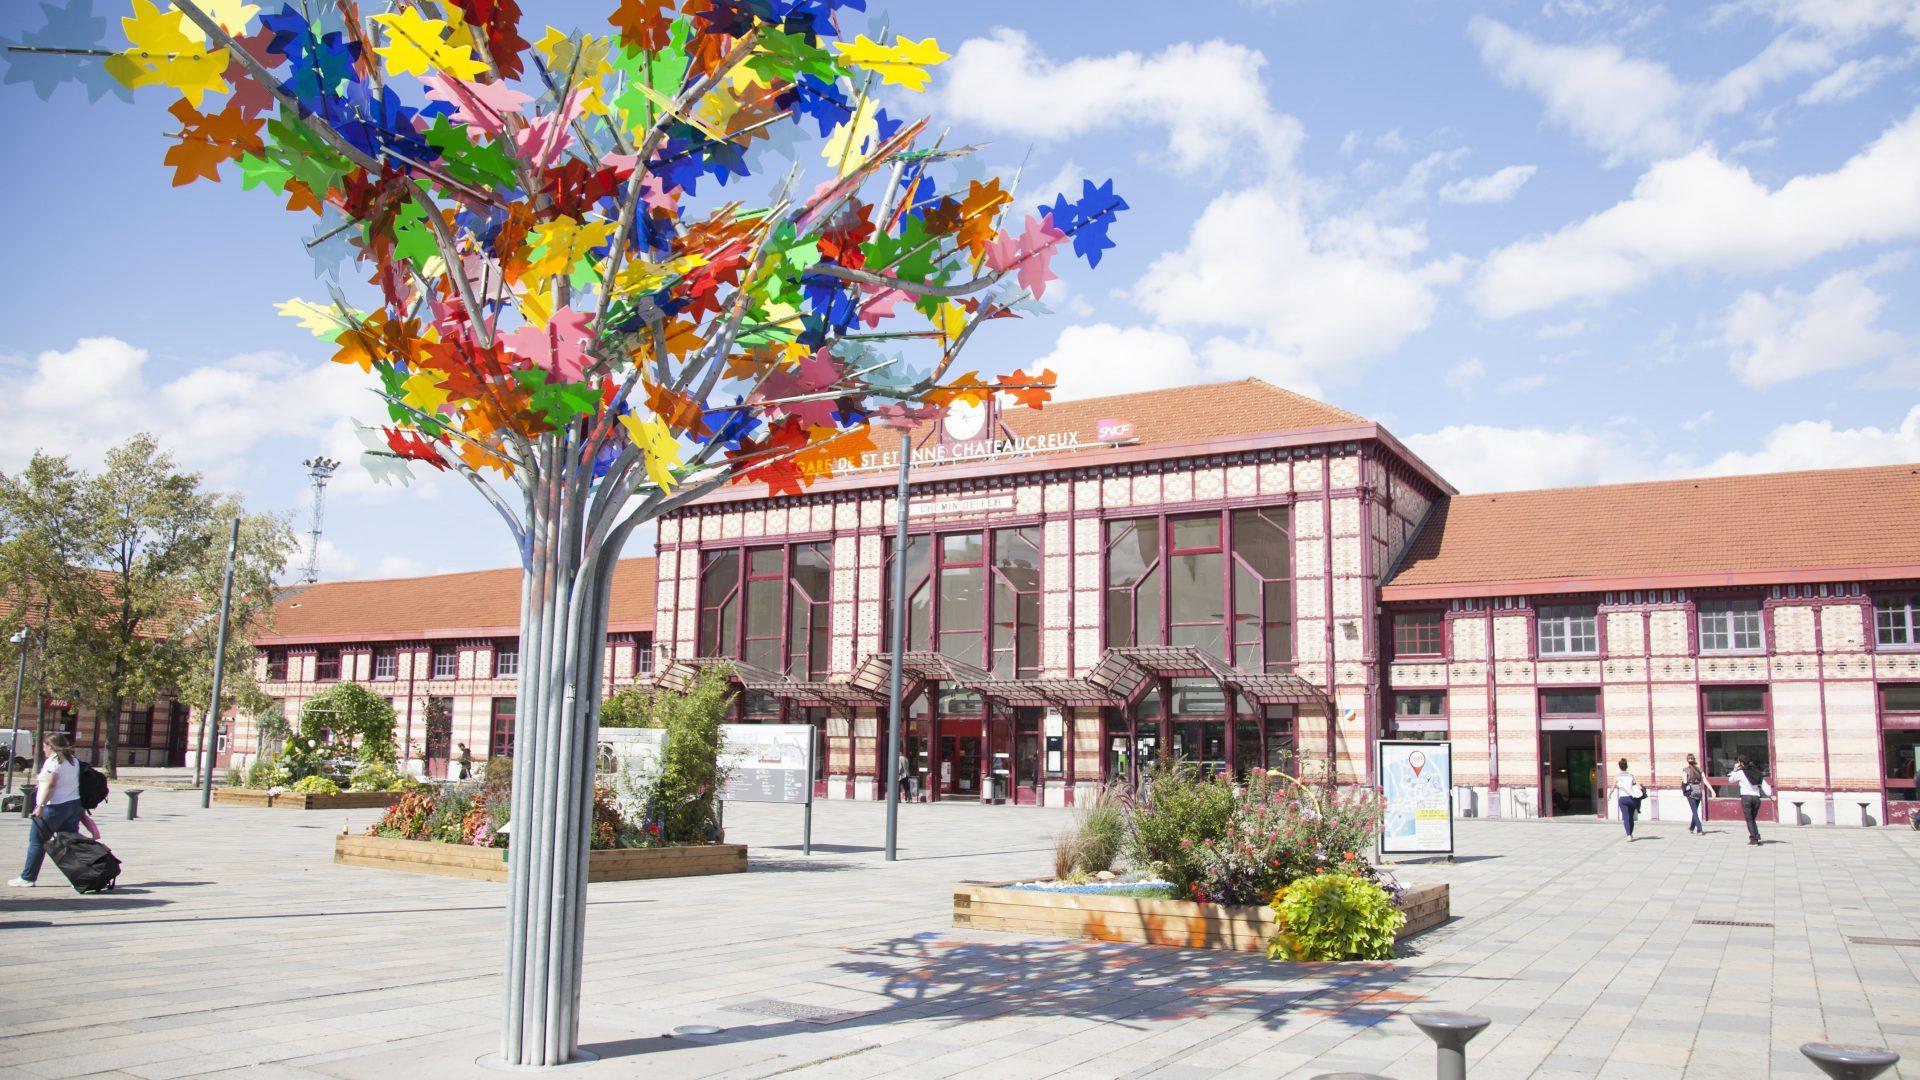 Magali Stora - Gare Châteaucreux